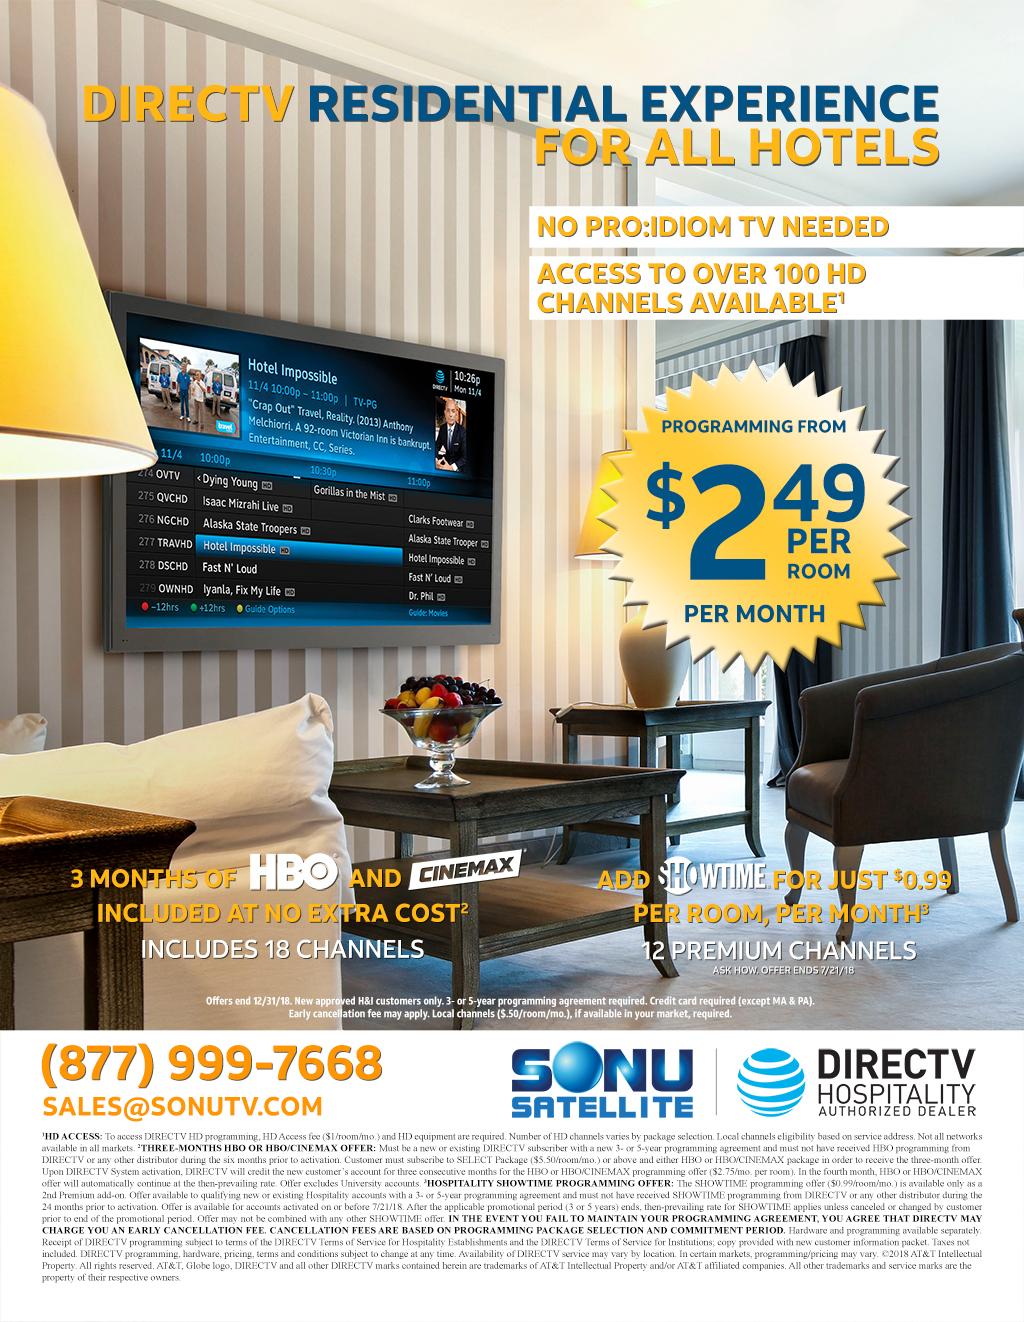 Radiant Hospitality Dre Tv Business Remote App Directv Business Logo Hospitality Business Per Room Directv Directv Business 2018 Directv inspiration Directv For Business